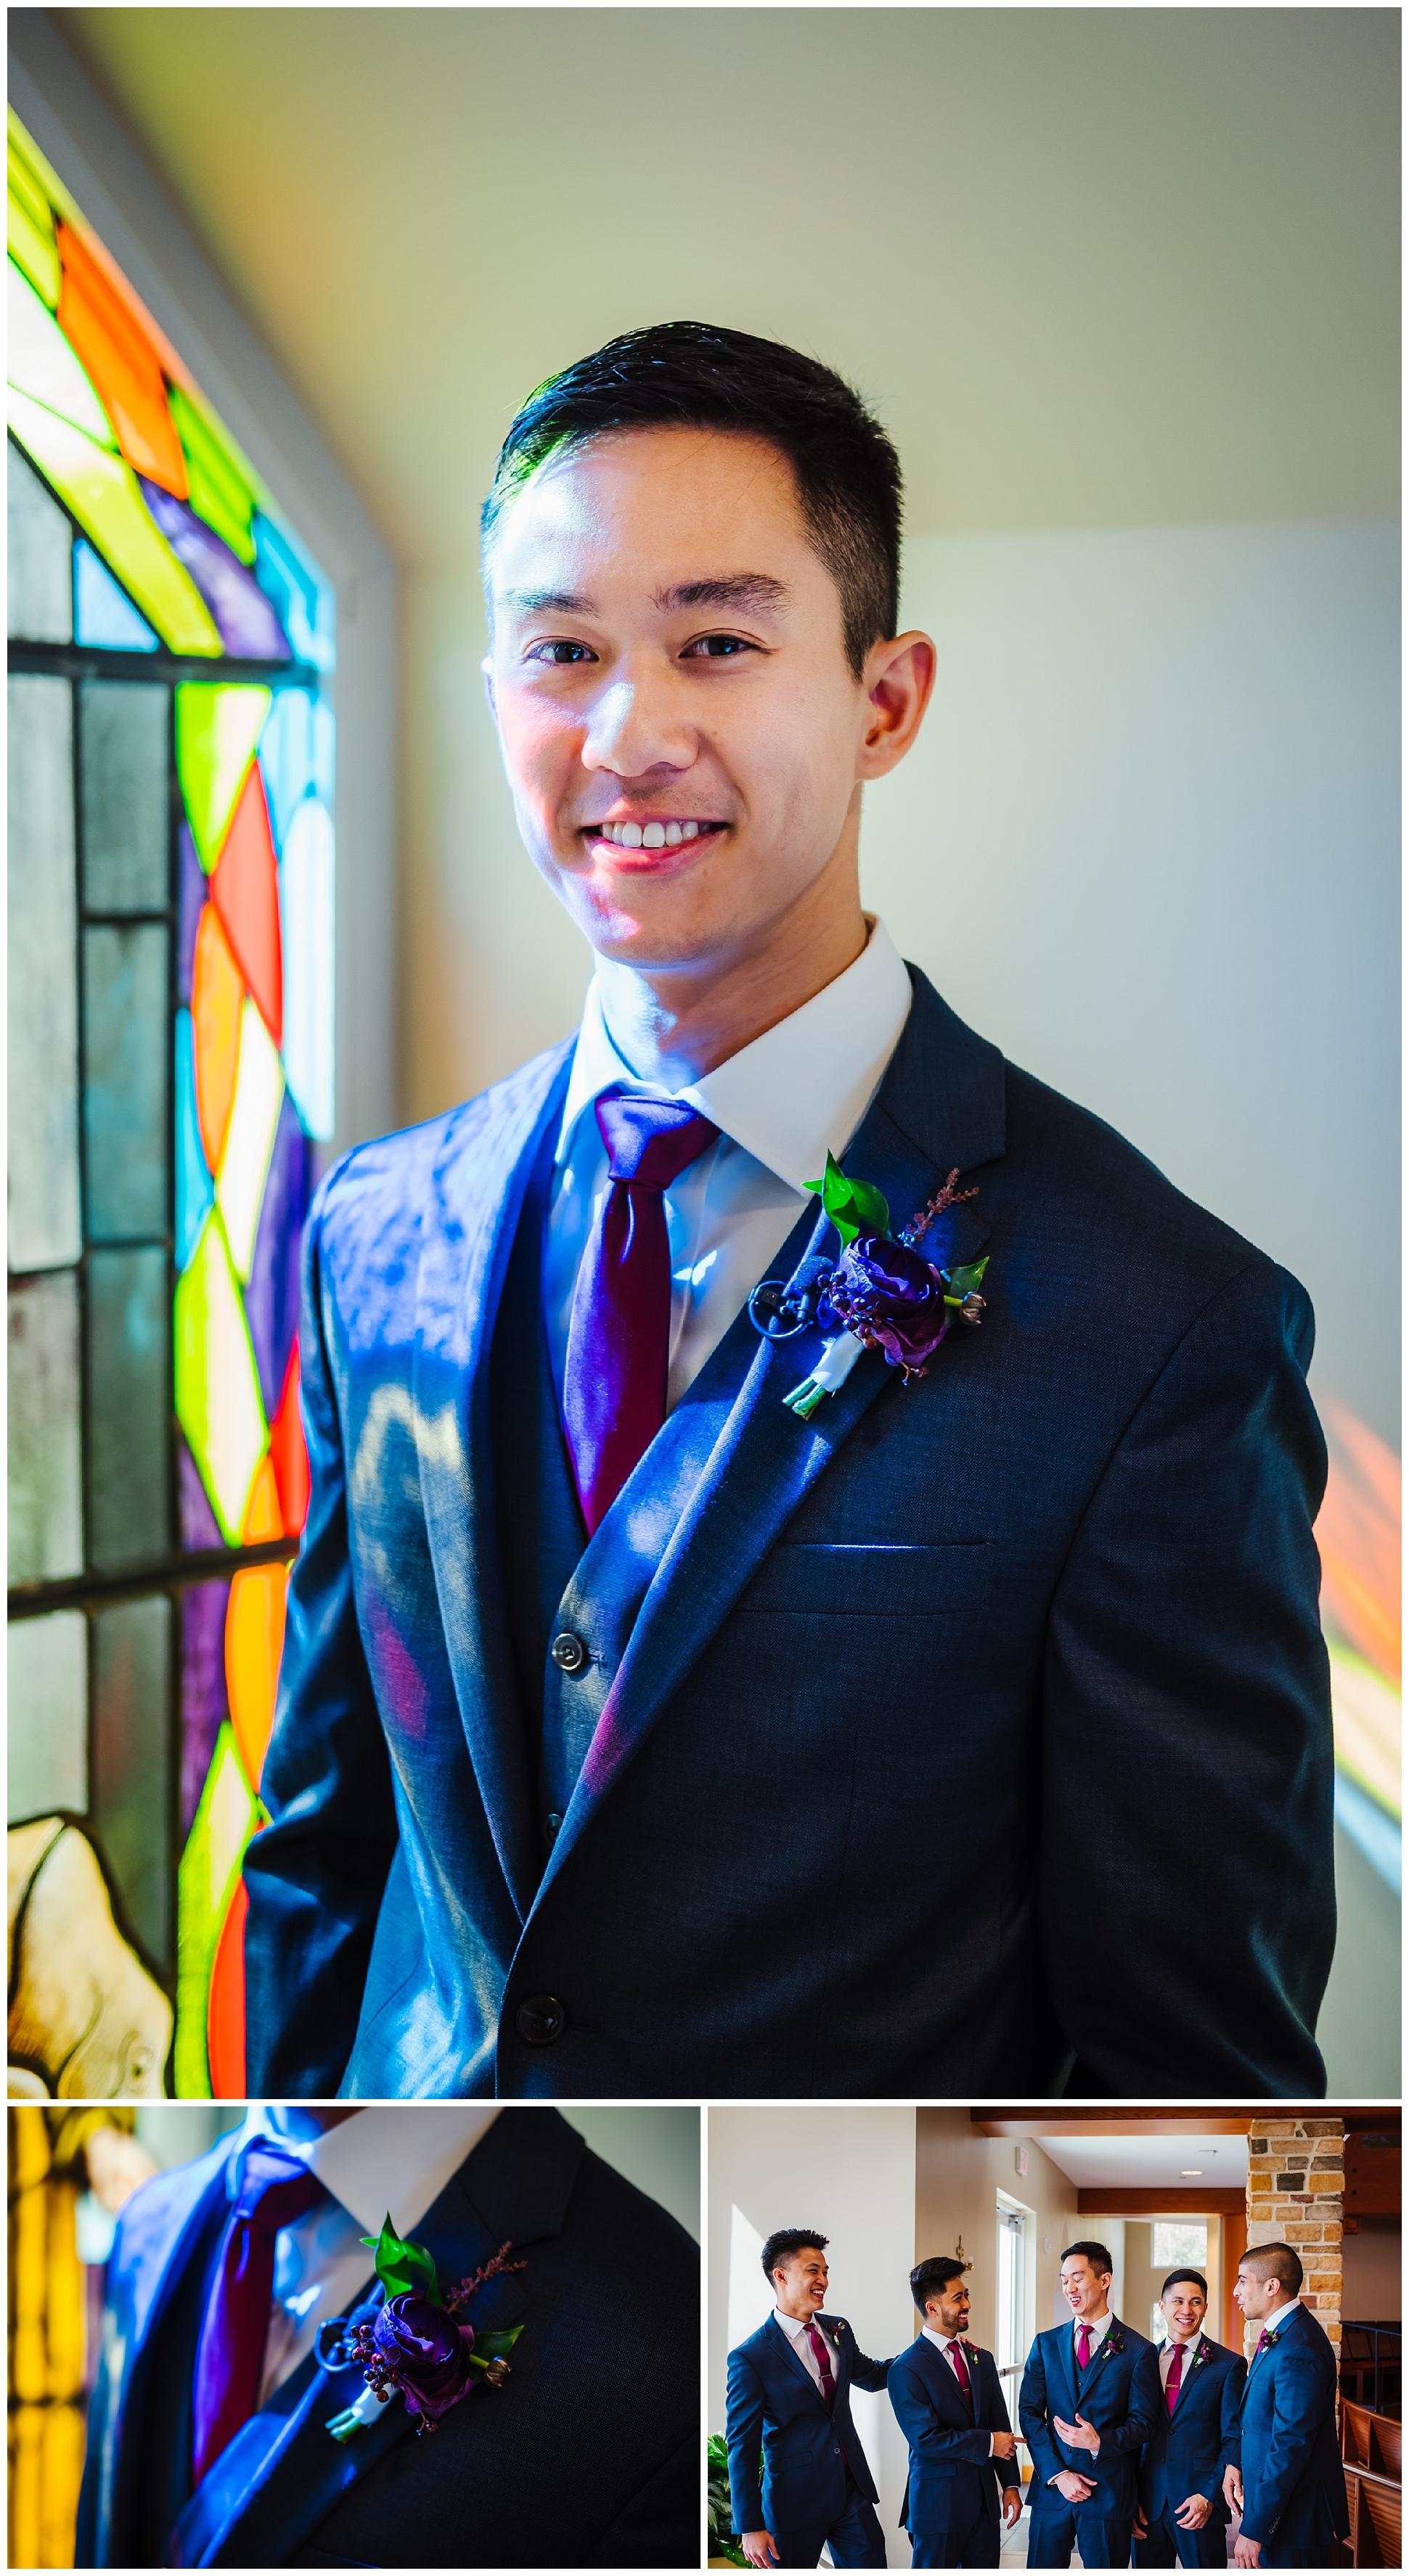 tampa-wedding-photographer-philipino-colorful-woods-ballroom-church-mass-confetti-fuscia_0022.jpg